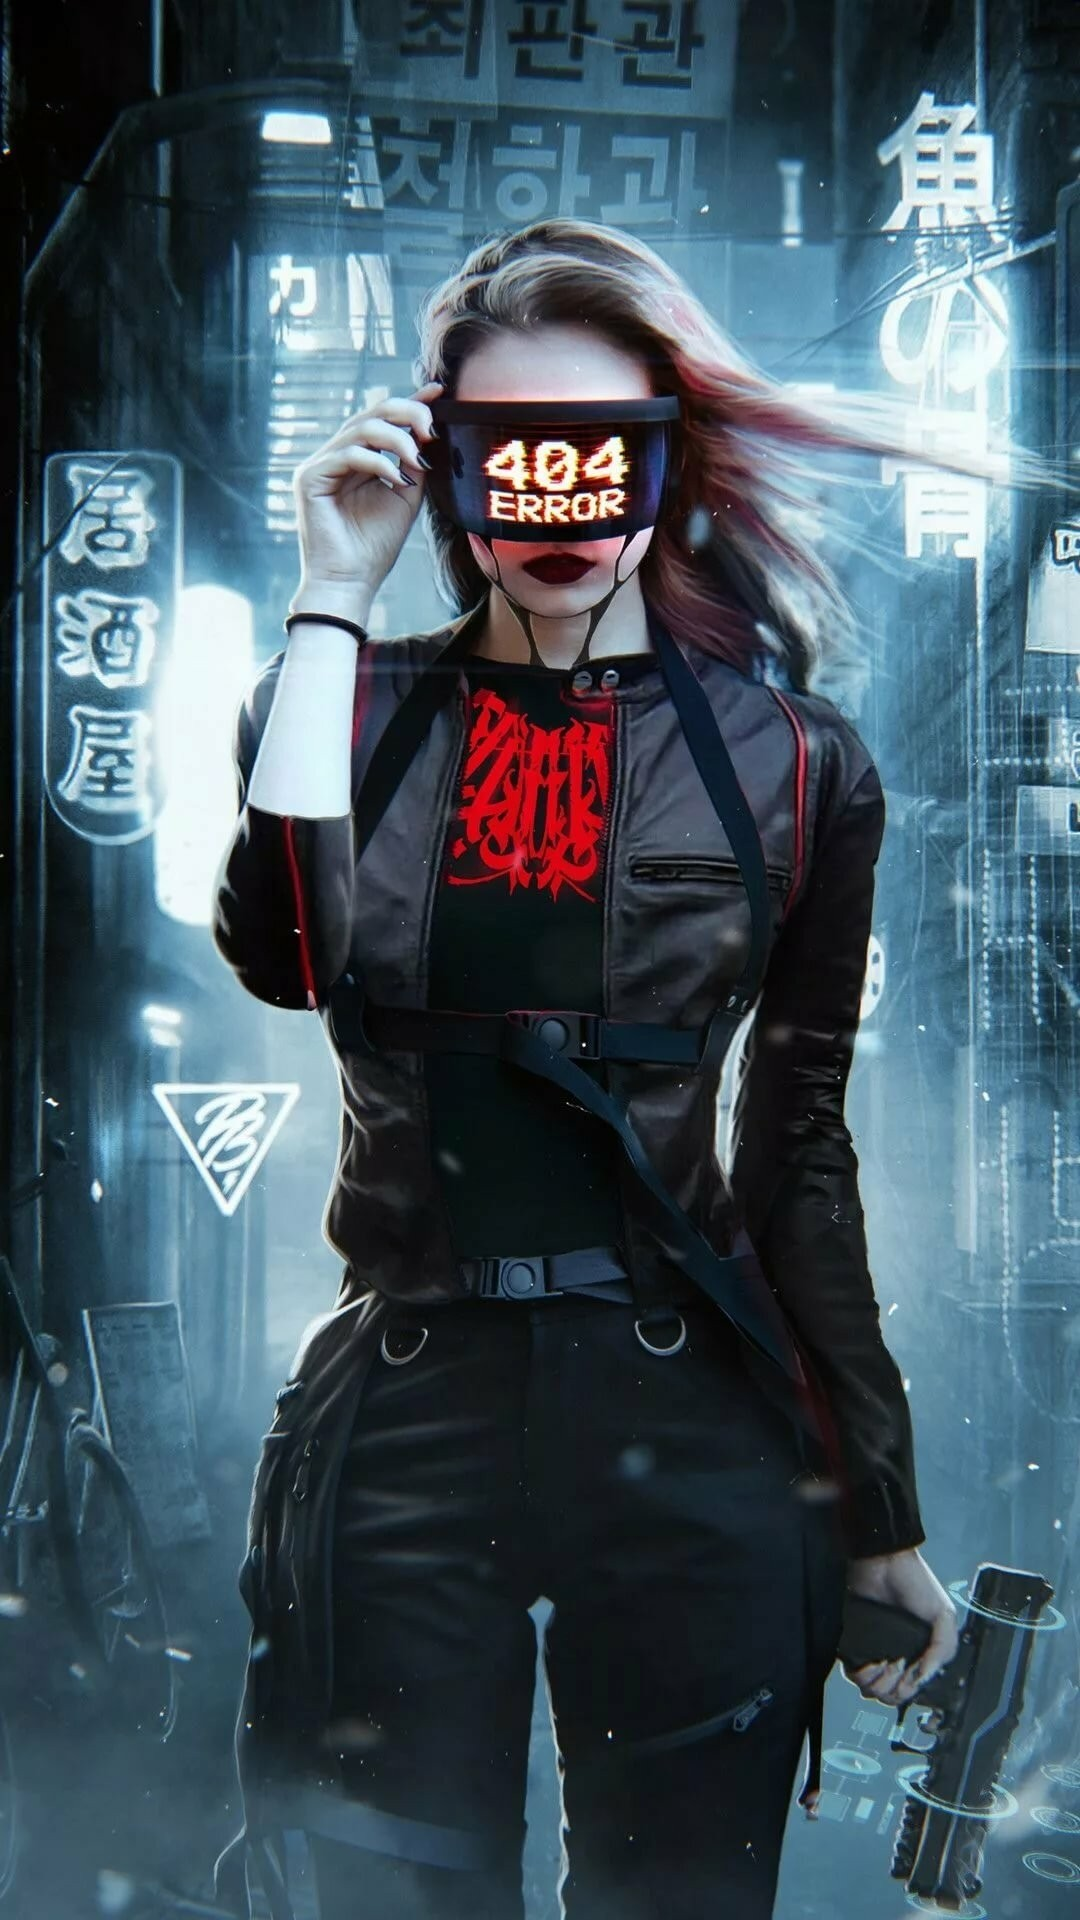 Cyberpunk iPhone hd wallpaper